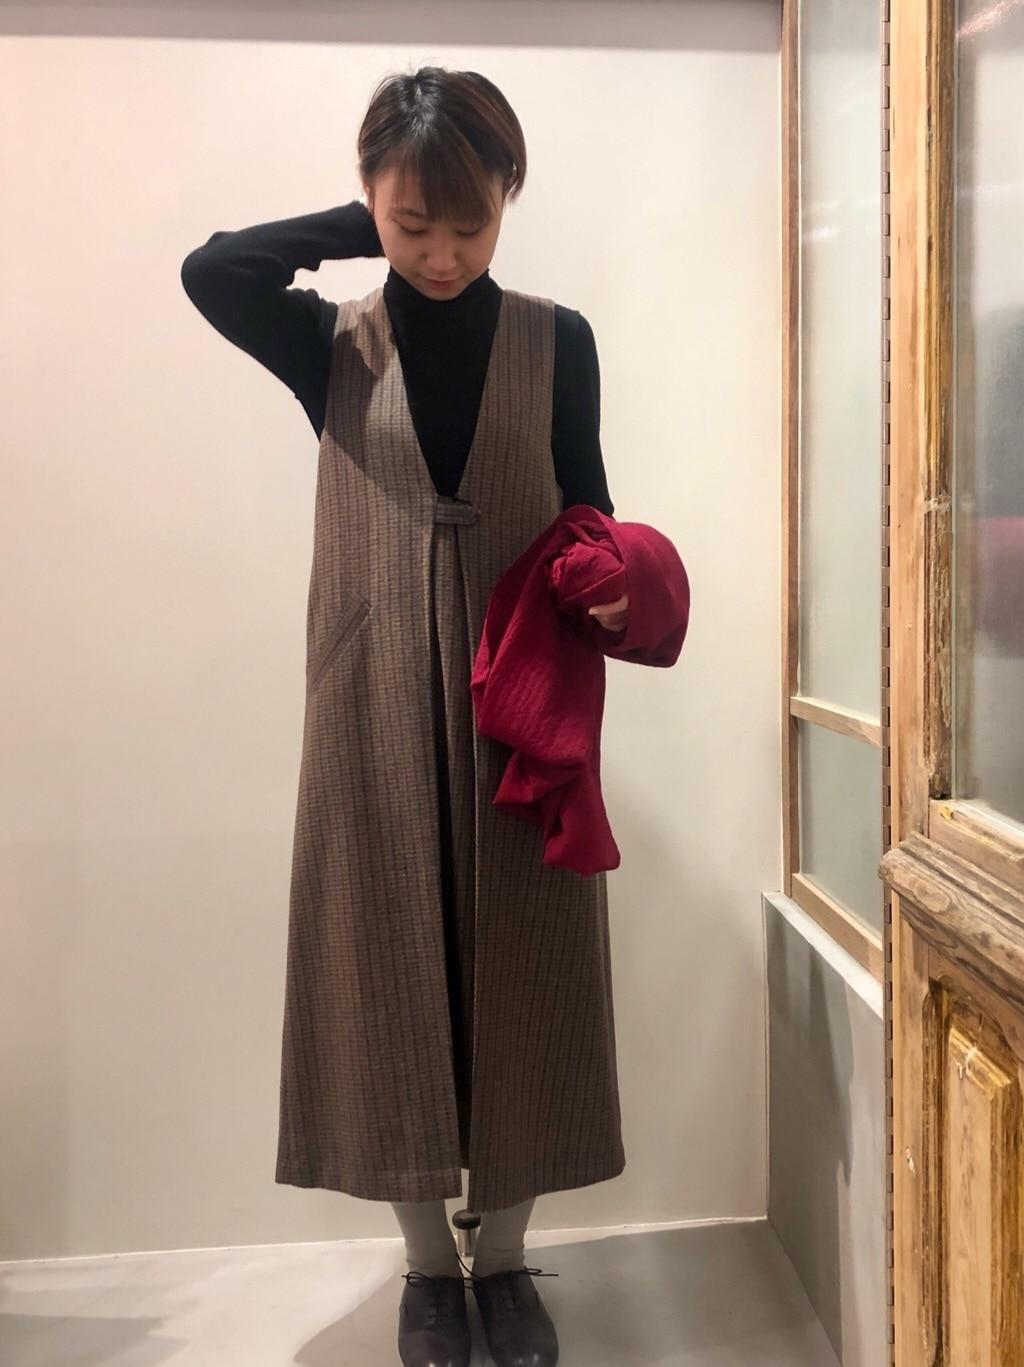 bulle de savon 渋谷スクランブルスクエア 身長:159cm 2019.11.23